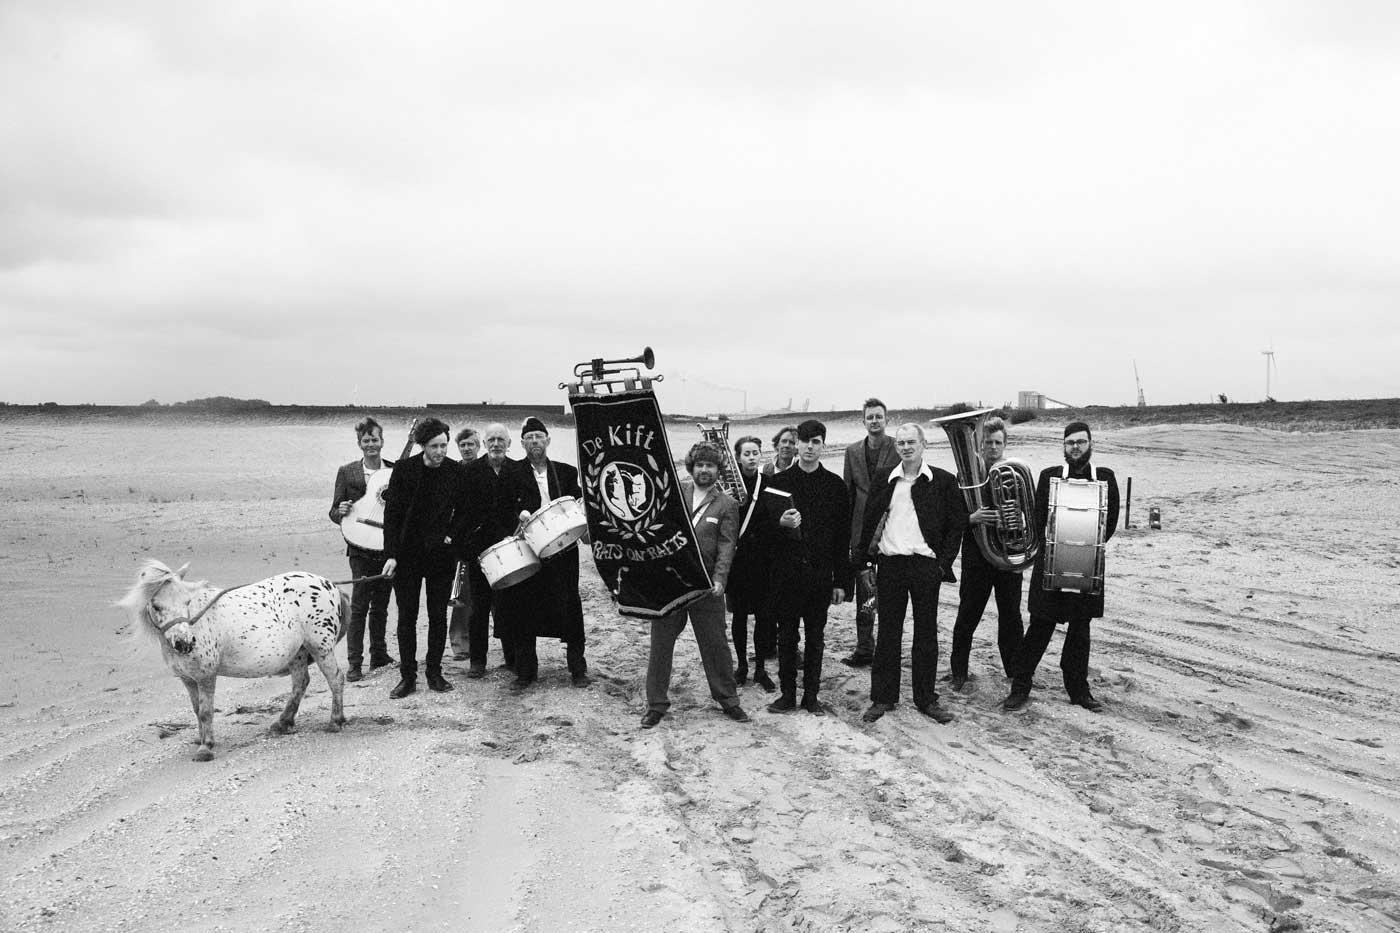 Post-punk y fanfarria, Rats On Rafts y De Kift